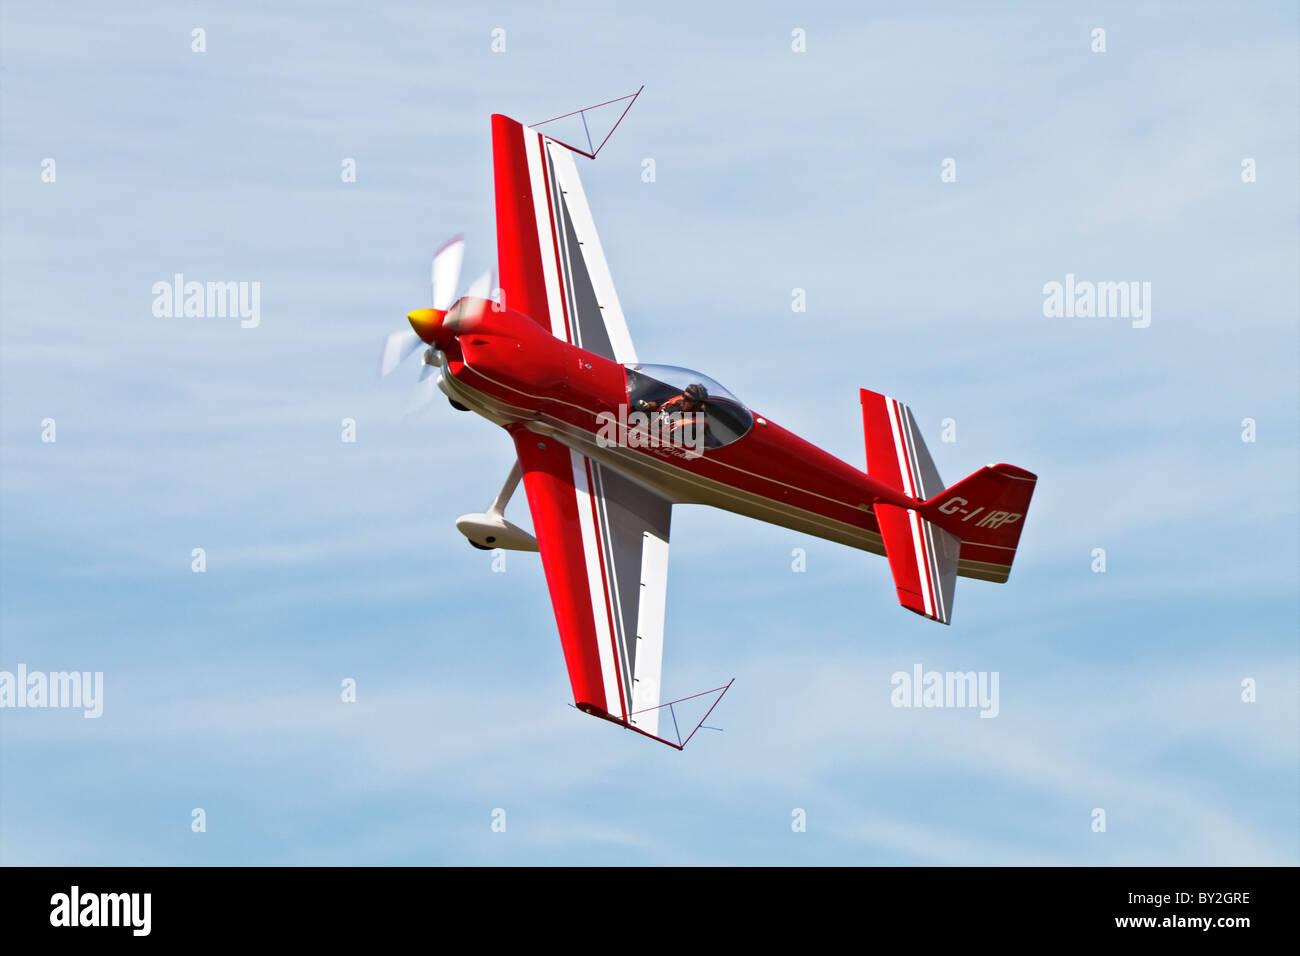 Mudry/Apex CAP232 aerobatic aircraft doing a knife edge - Stock Image